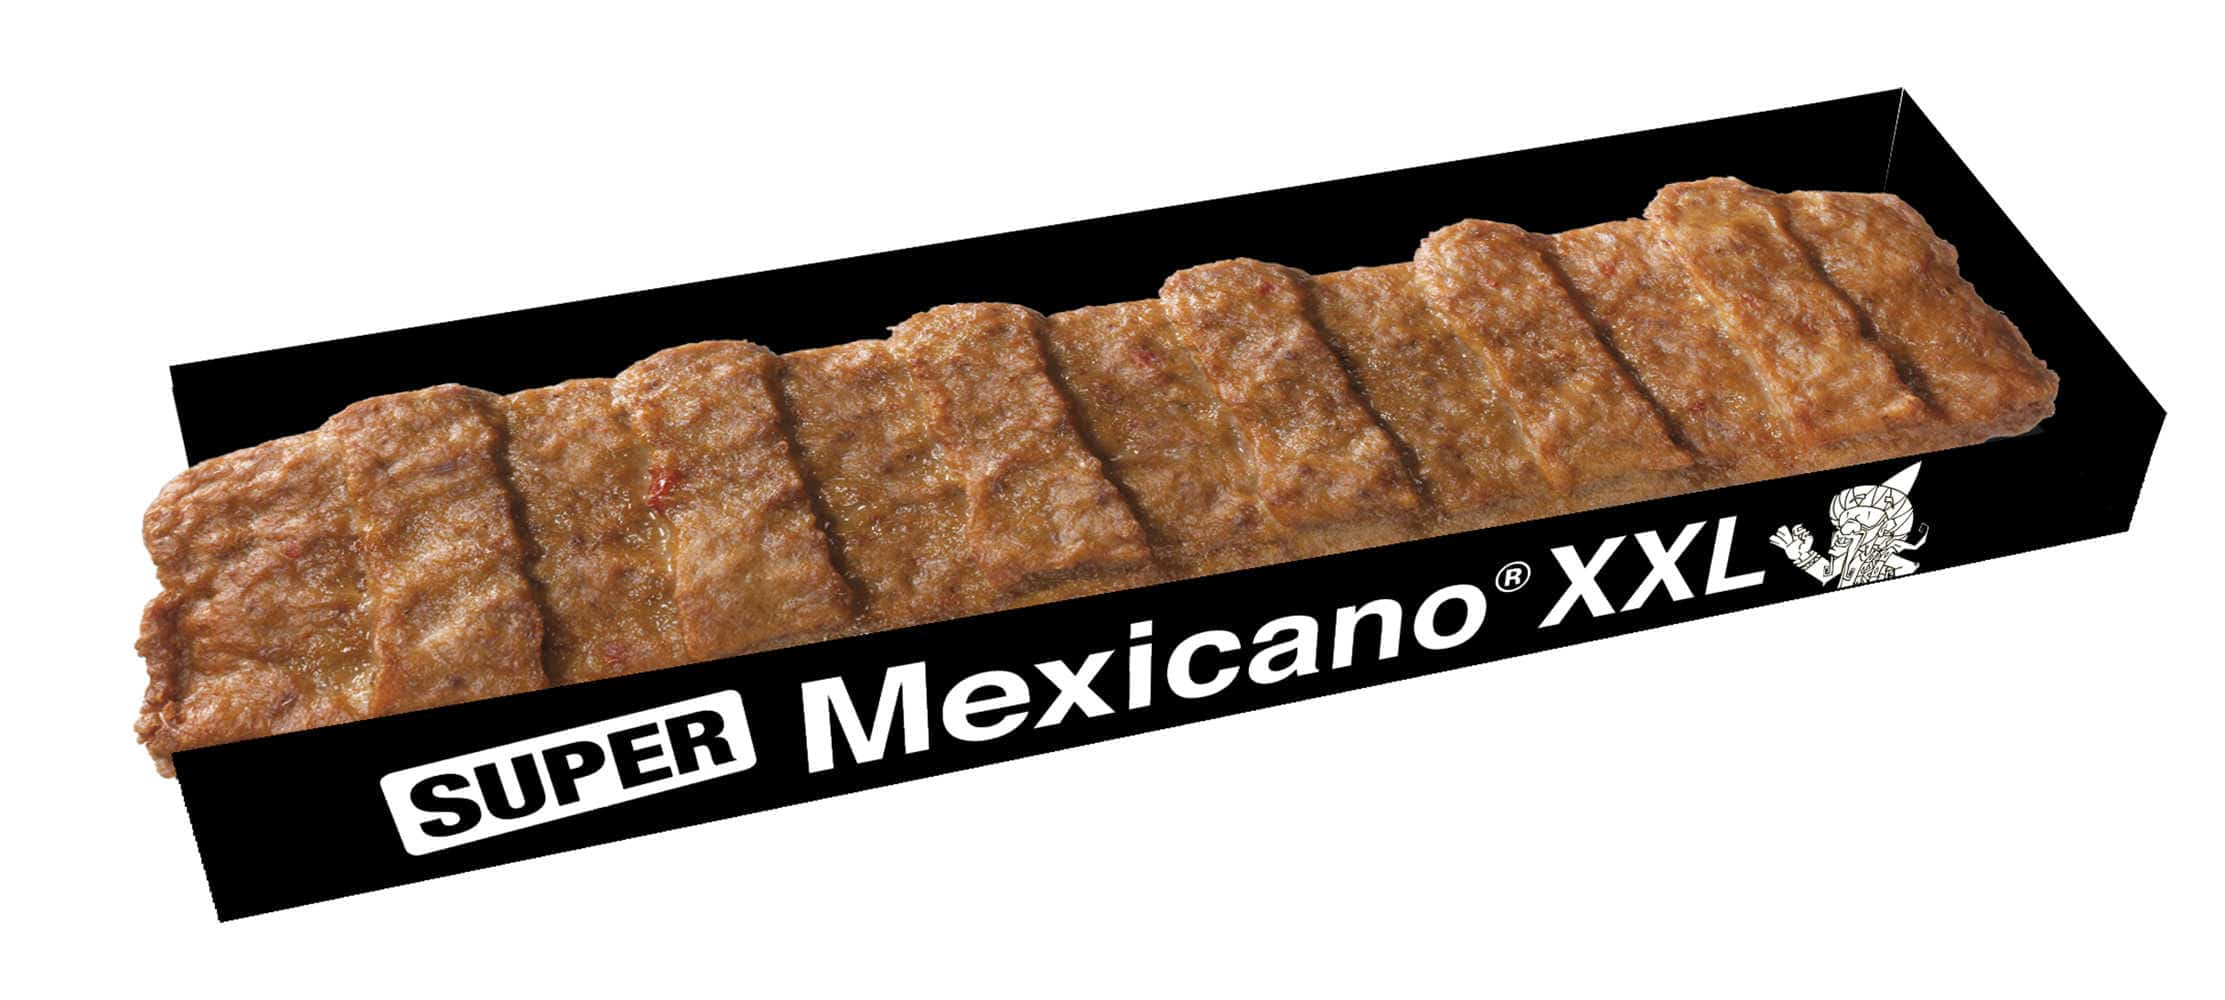 Mexicano XXL